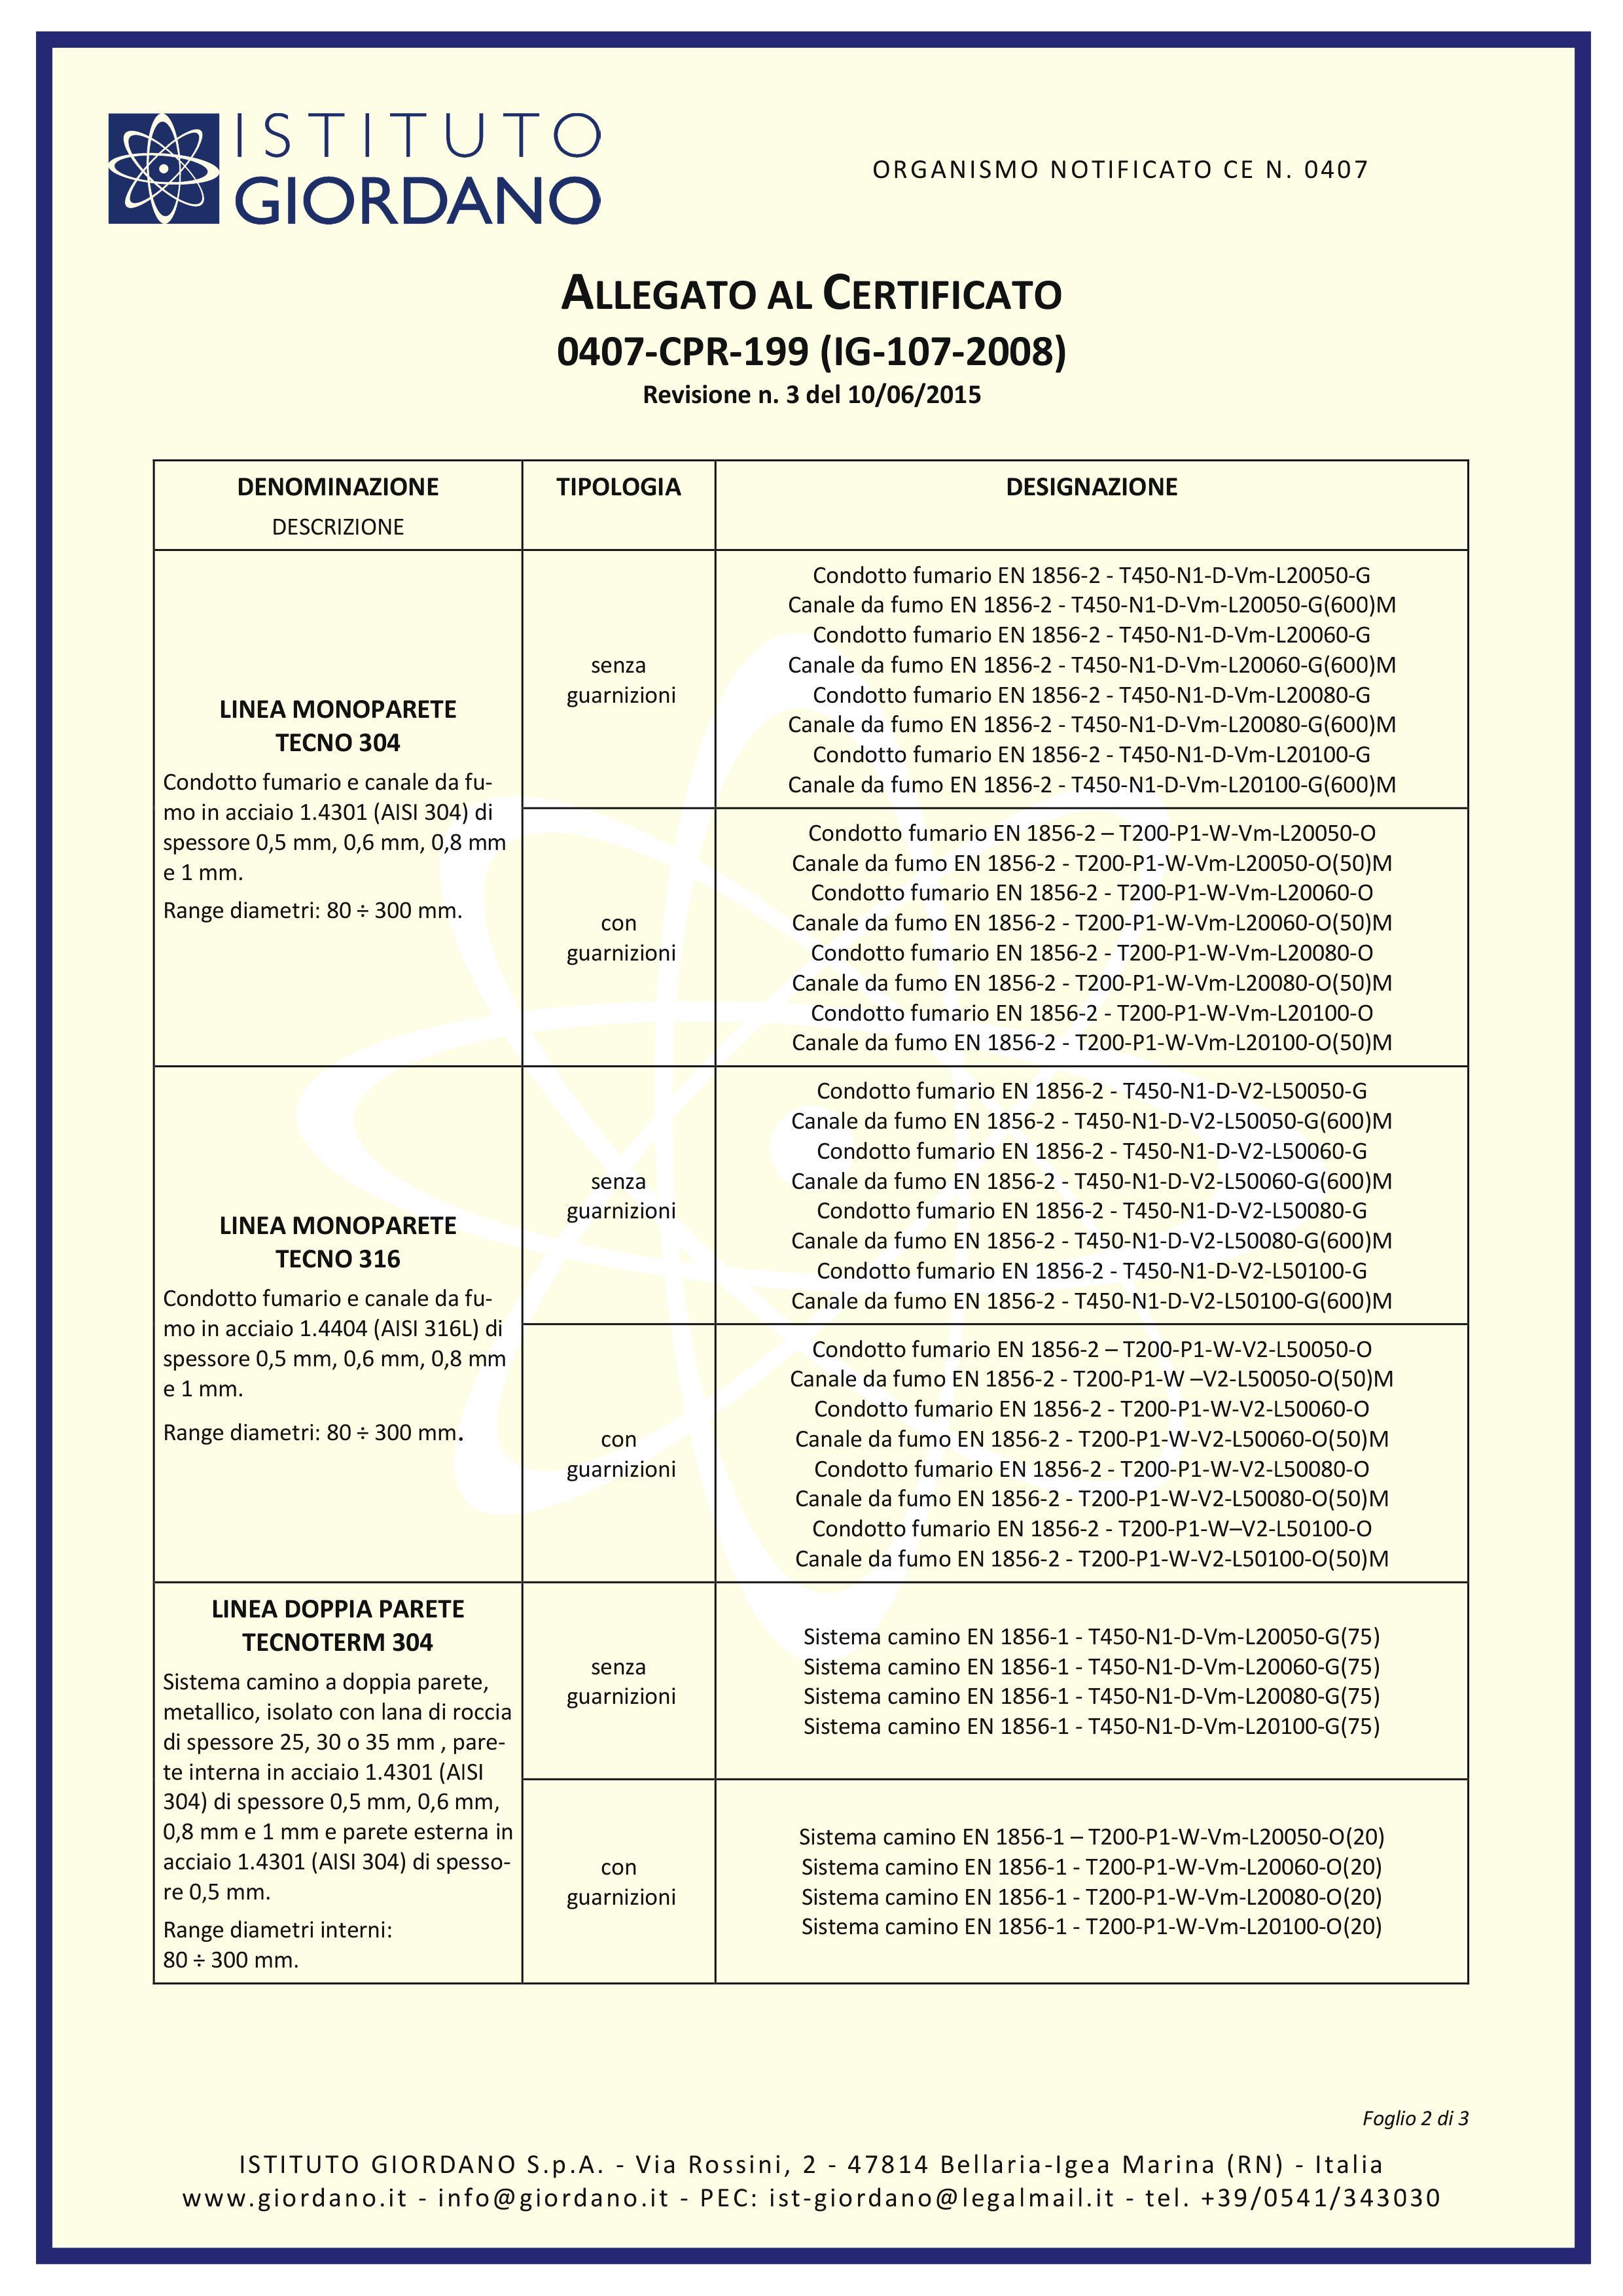 certificato tecnometal camini metallici 2